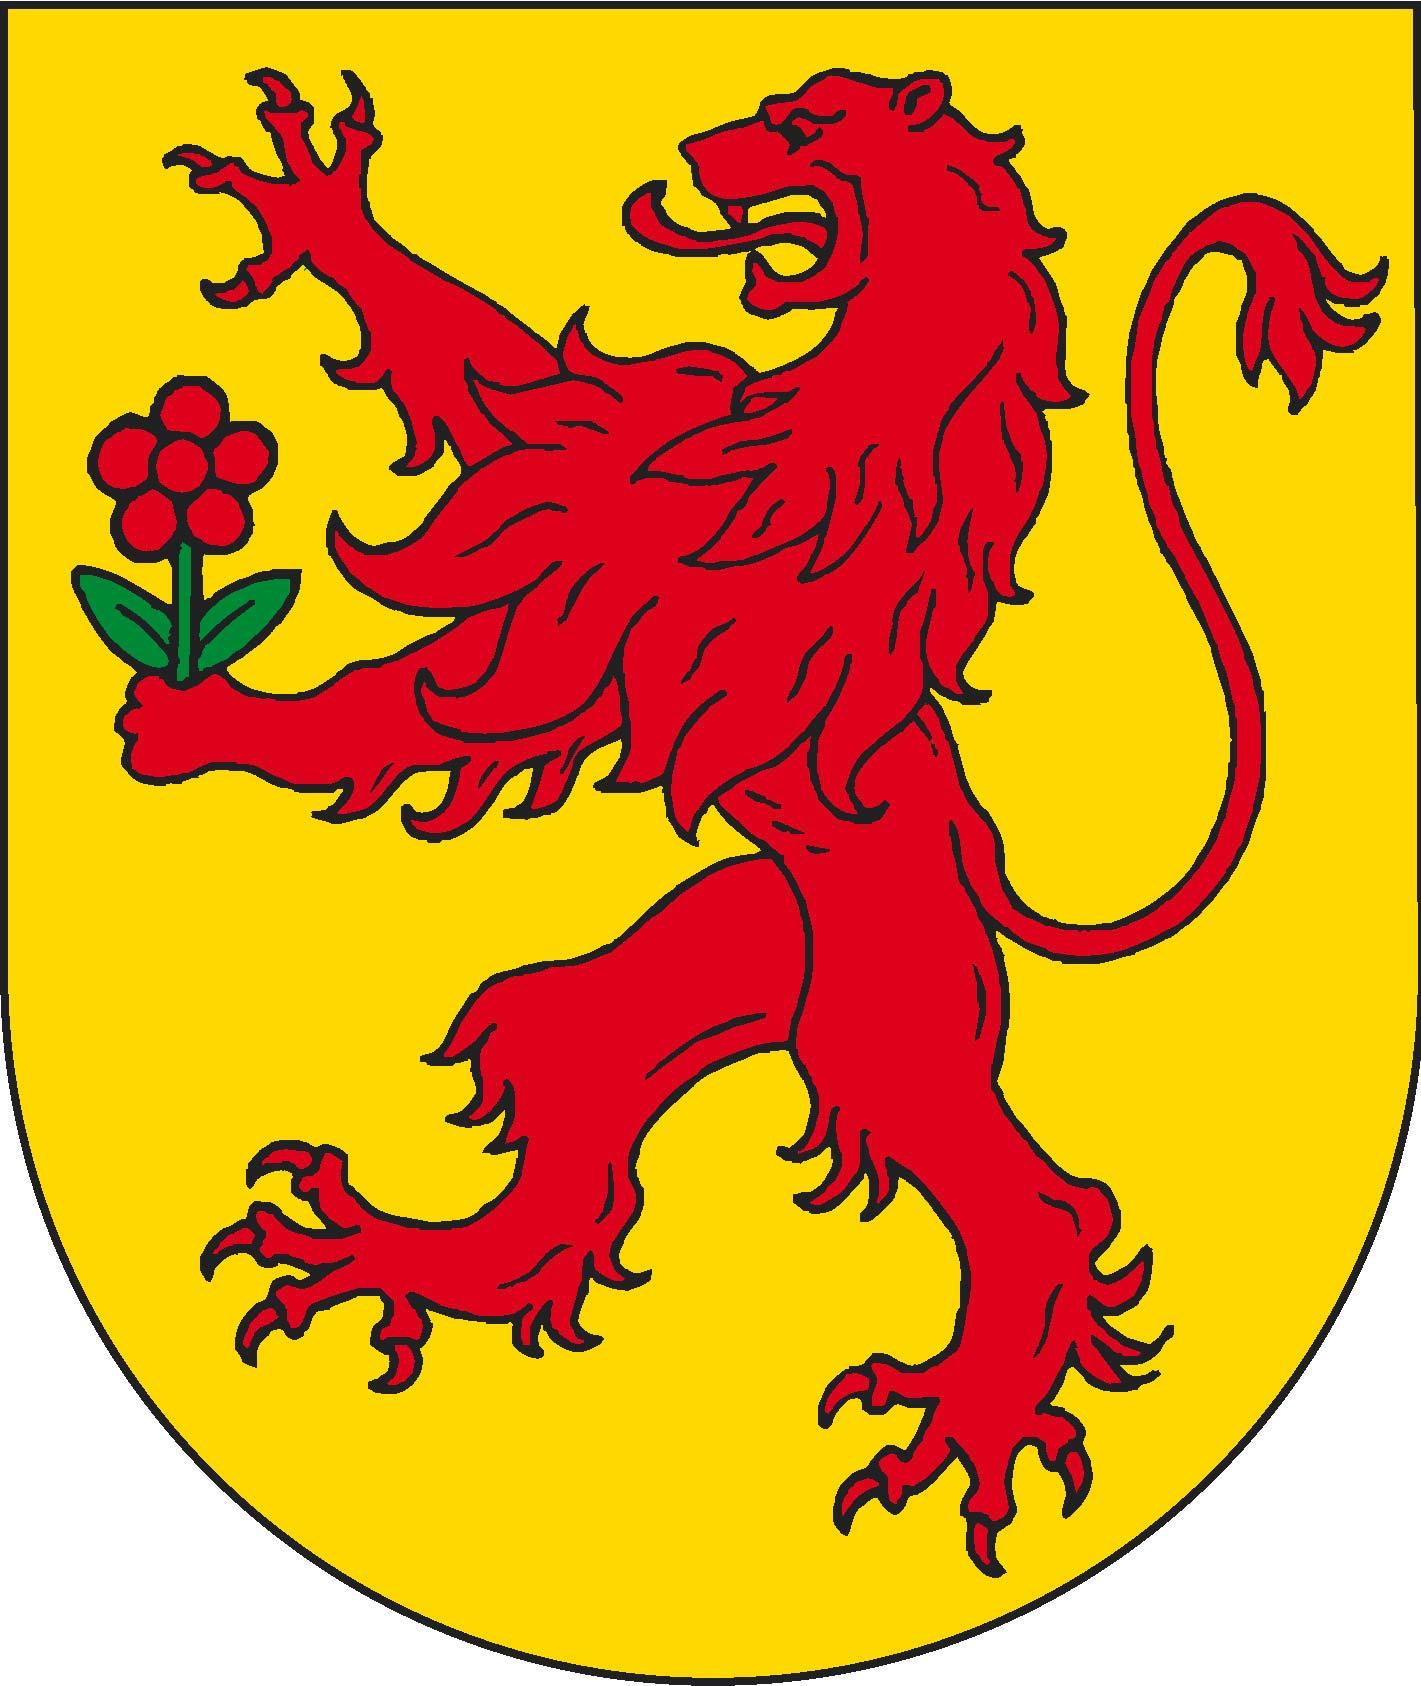 Blason de Nollingen, aujourd'hui le blason de Rheinfelden (Bade)